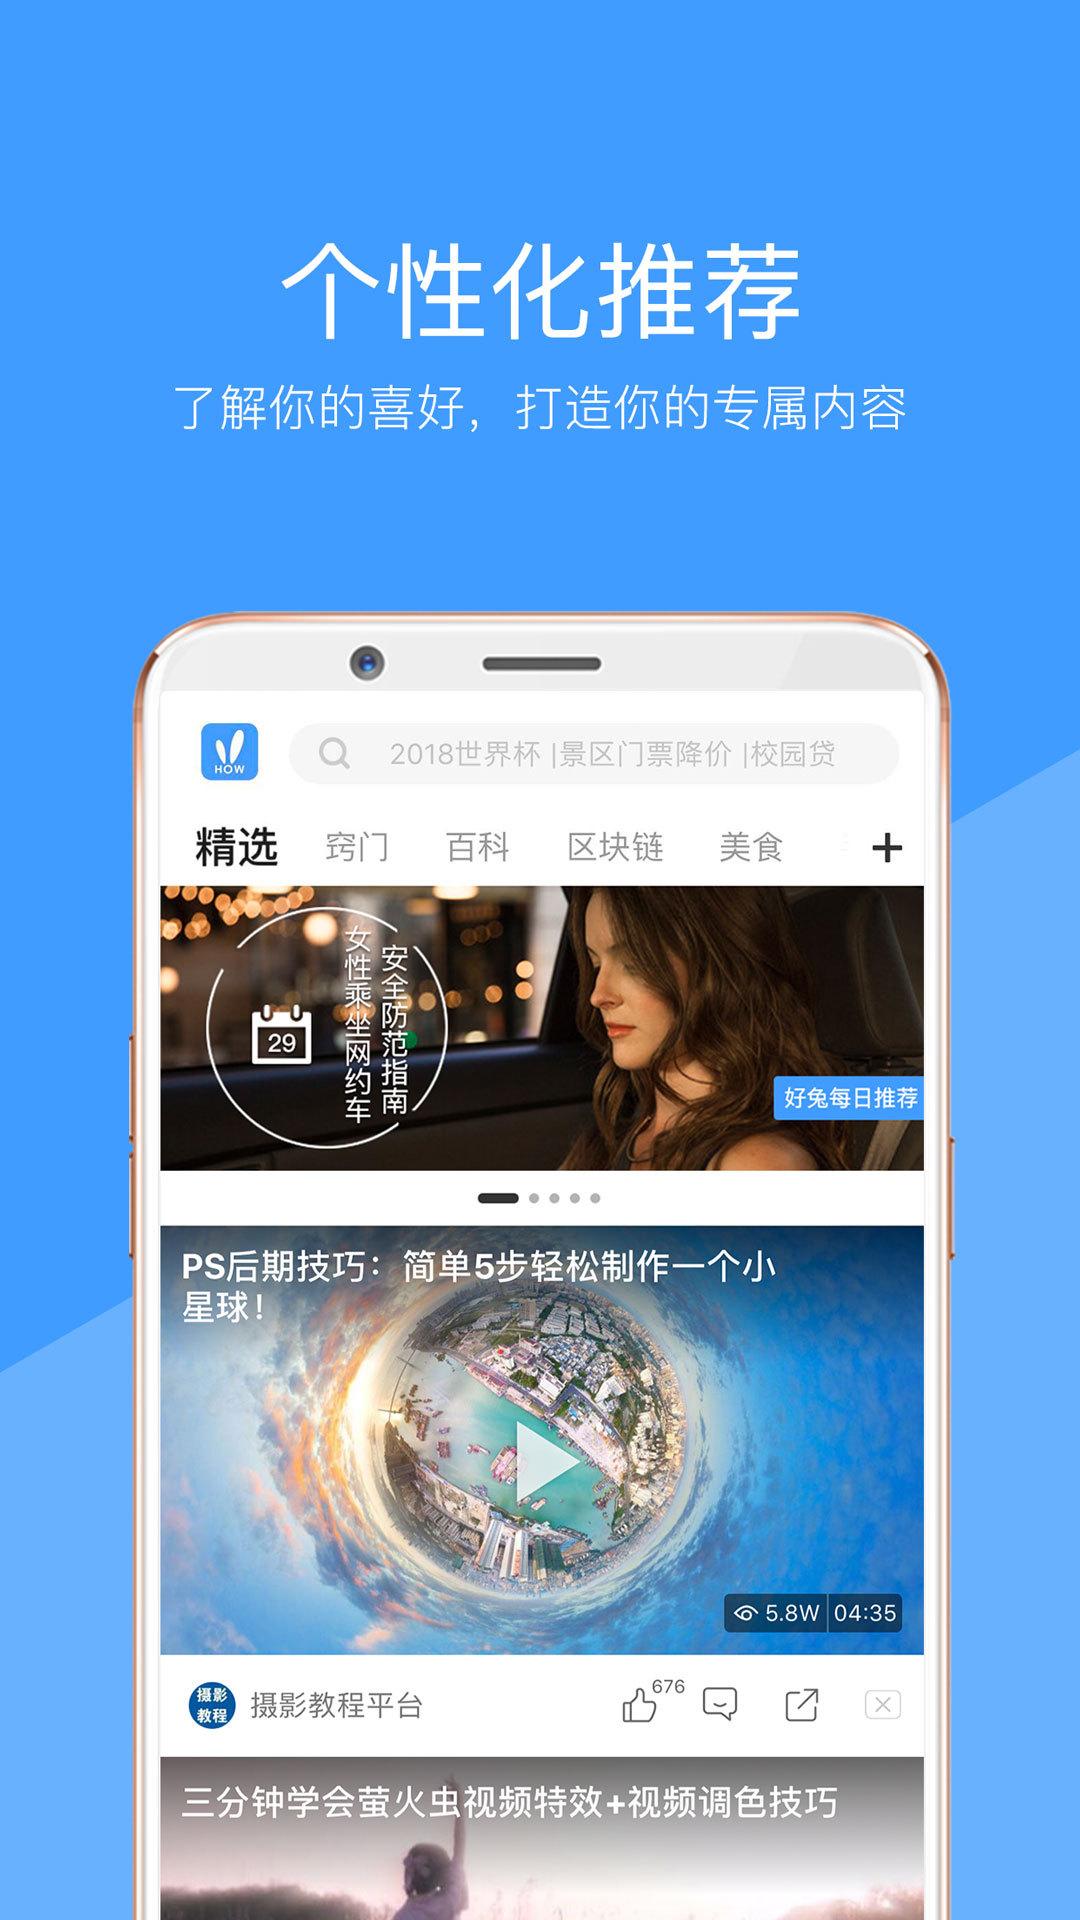 第 一 坊 app 破解 版 安卓